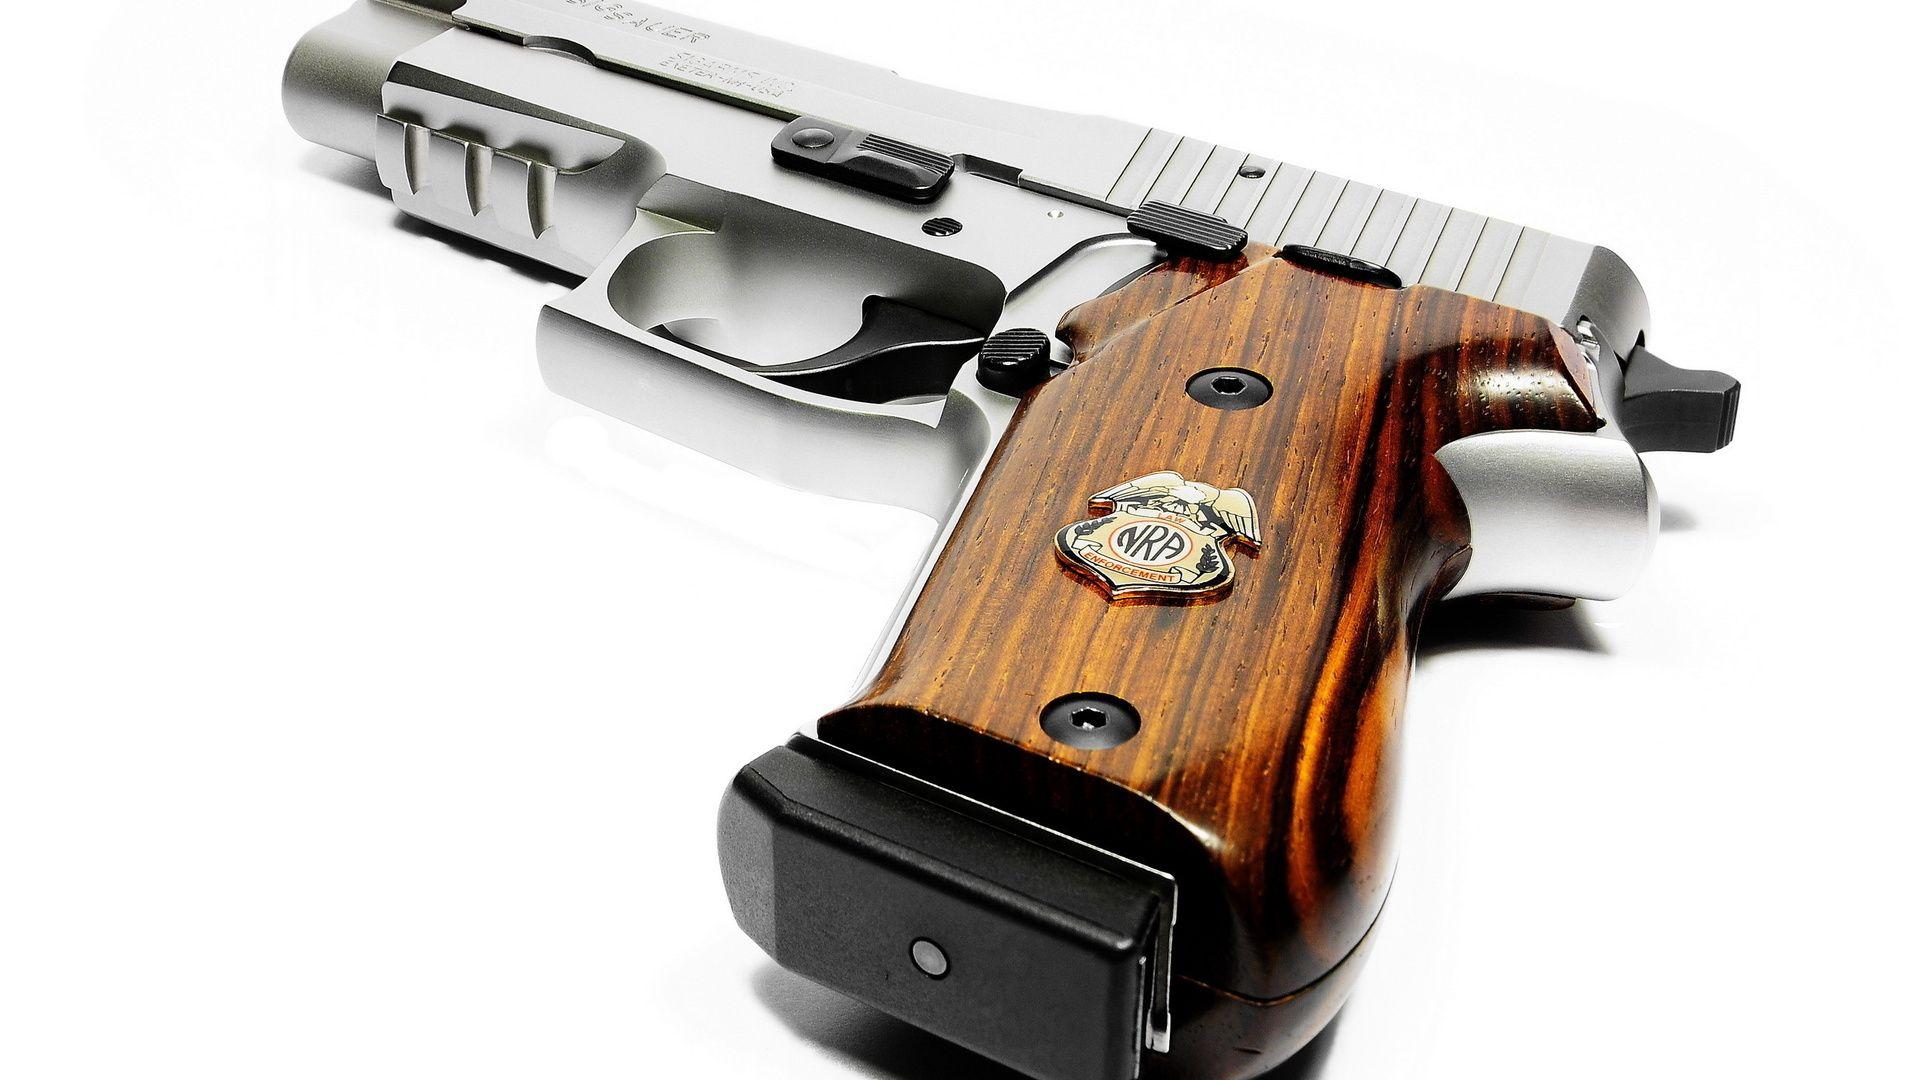 Gun For Desktop hd wallpaper 1080